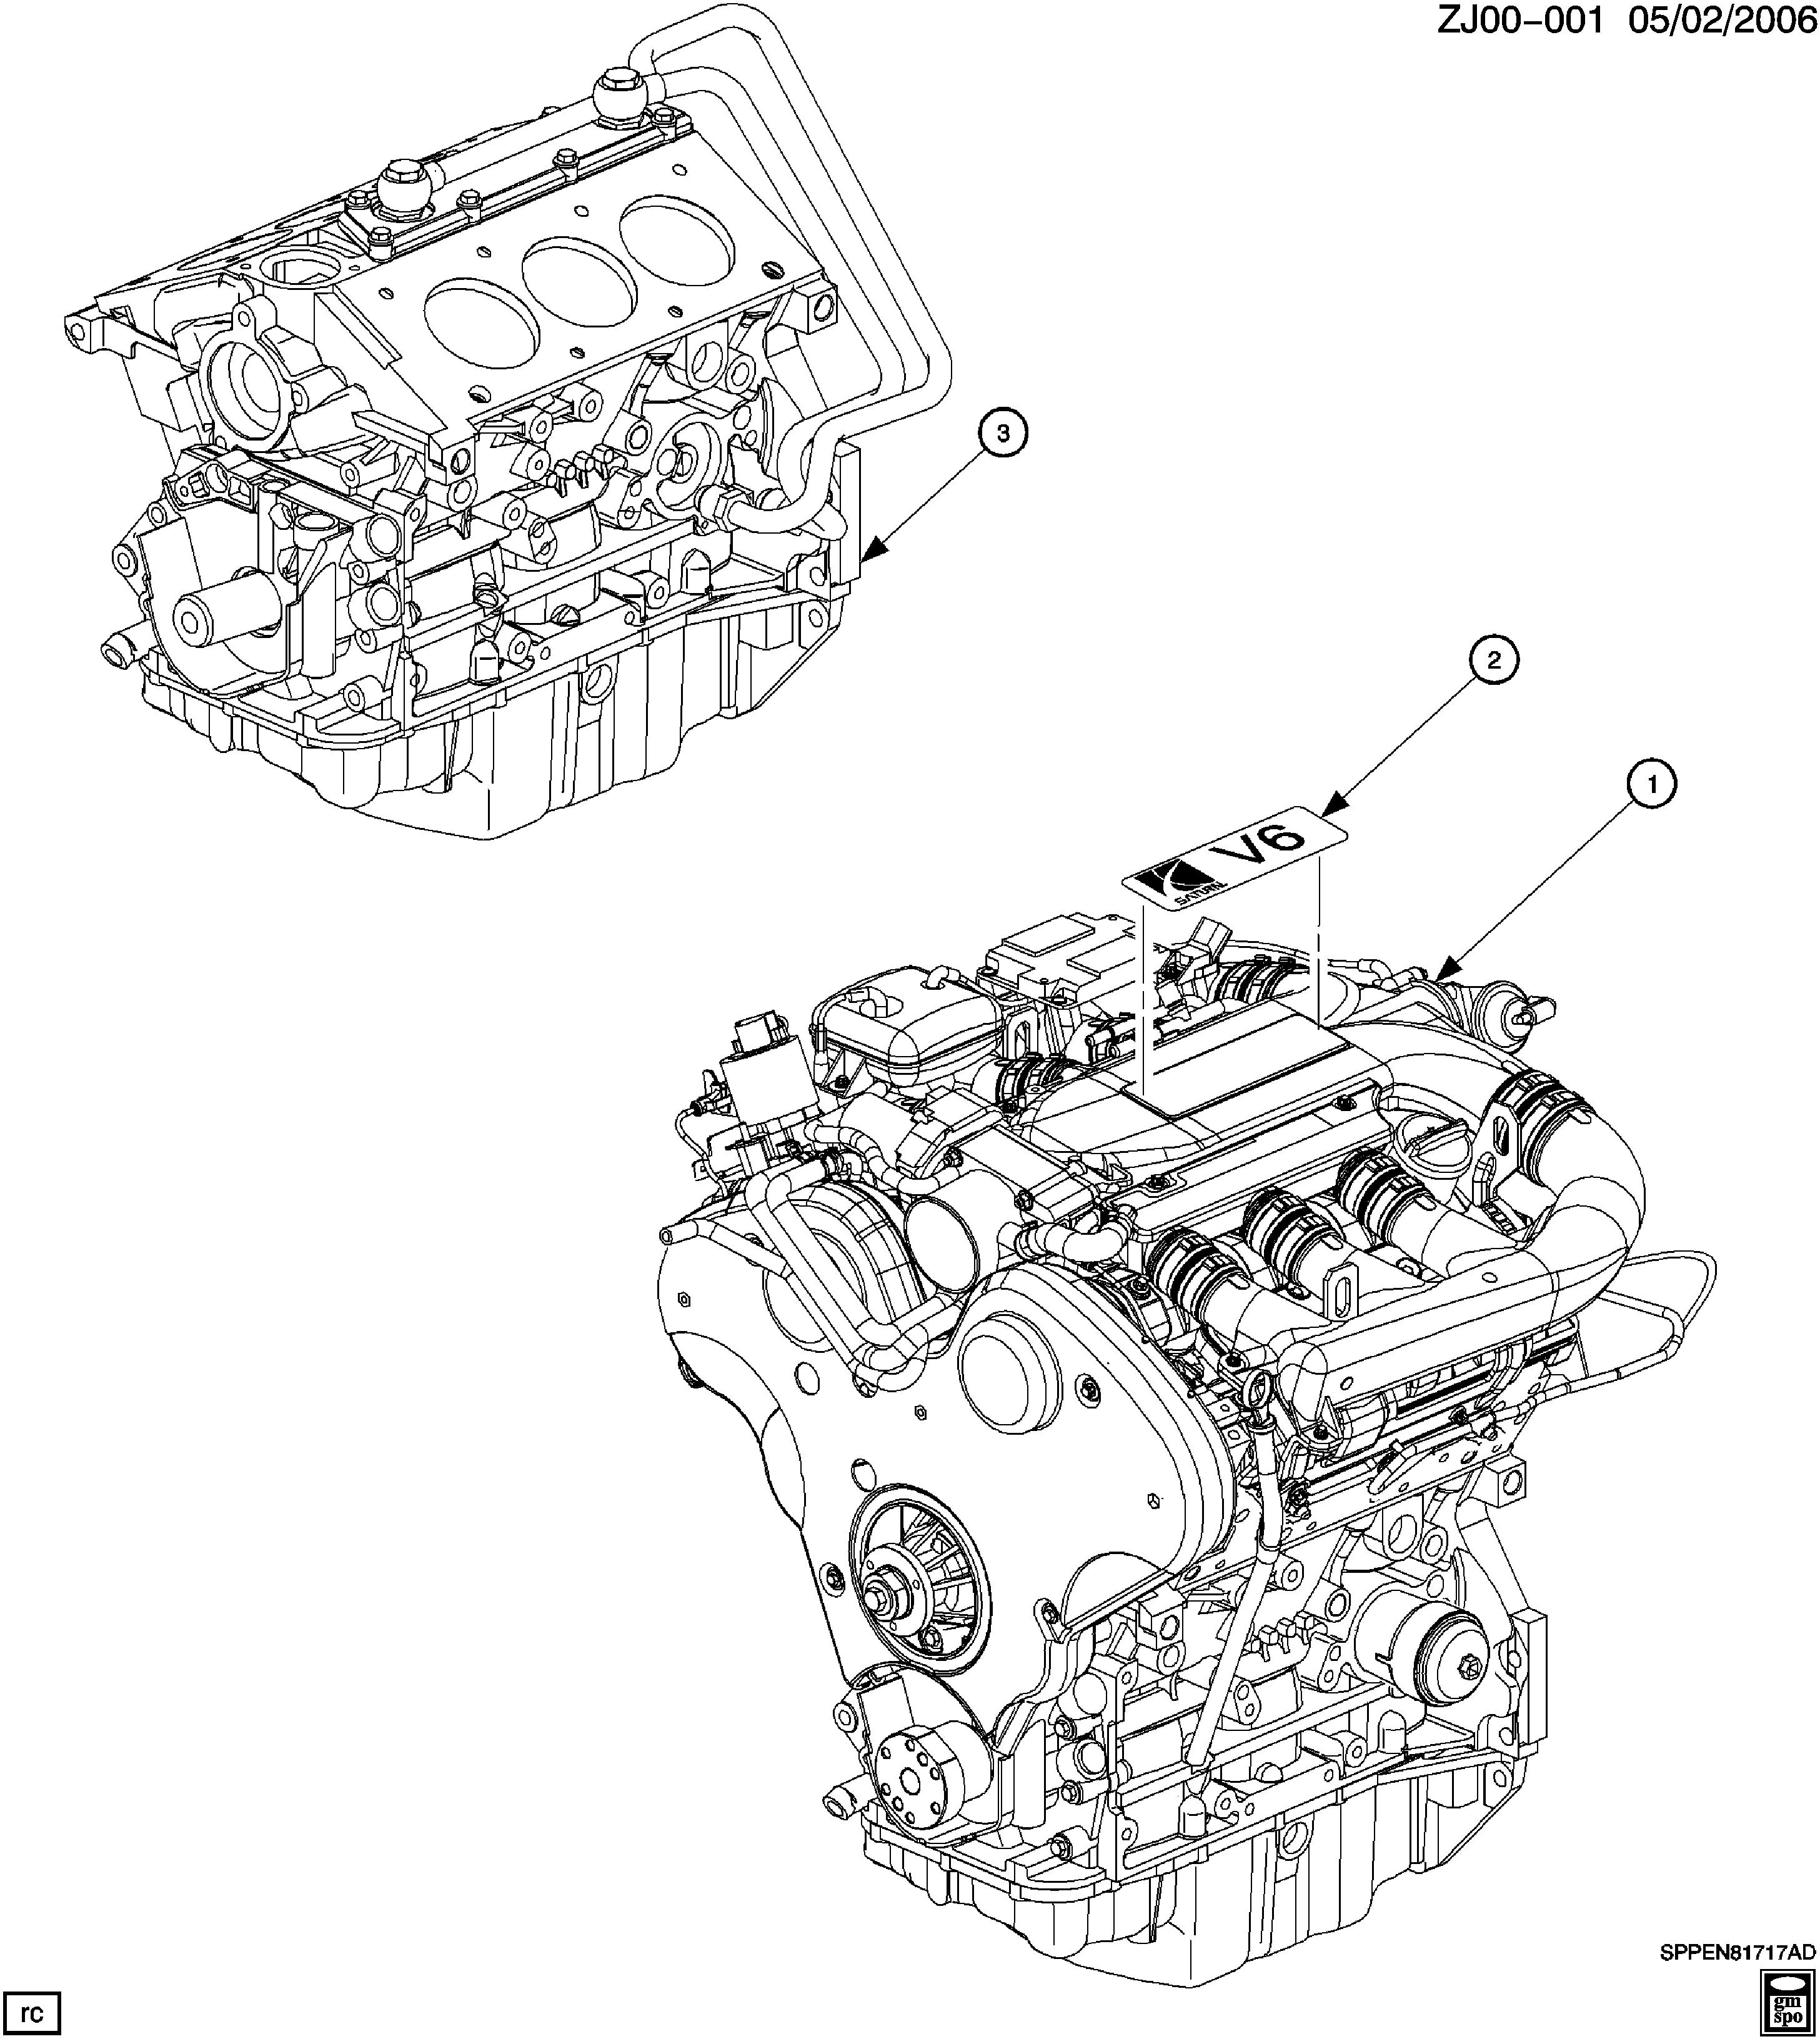 [SCHEMATICS_48YU]  Saturn L-Series - J ENGINE ASM & PARTIAL ENGINE (L81/3.0R) > EPC Online >  Nemiga.com | L81 Engine Diagram |  | nemigaparts.com